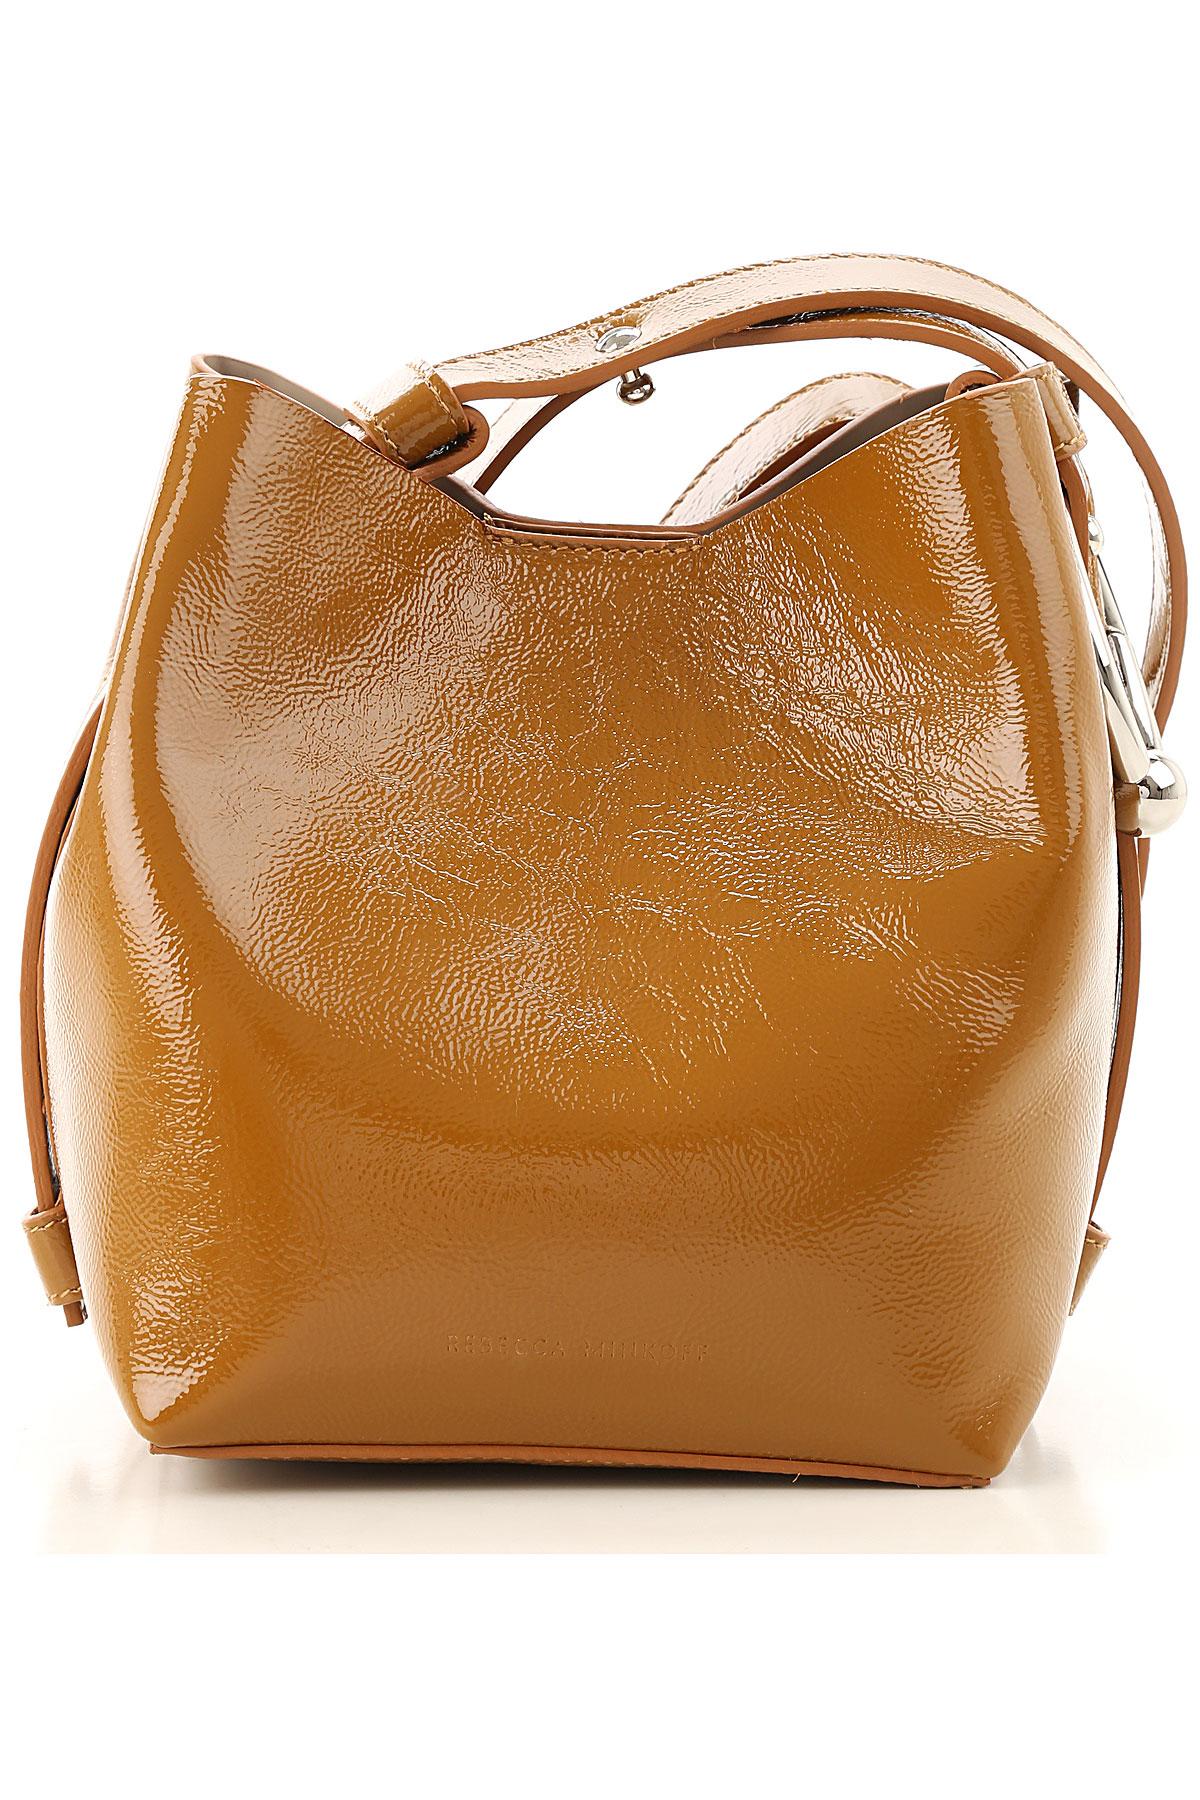 Rebecca Minkoff Shoulder Bag for Women On Sale, Brown, Patent Leather, 2019